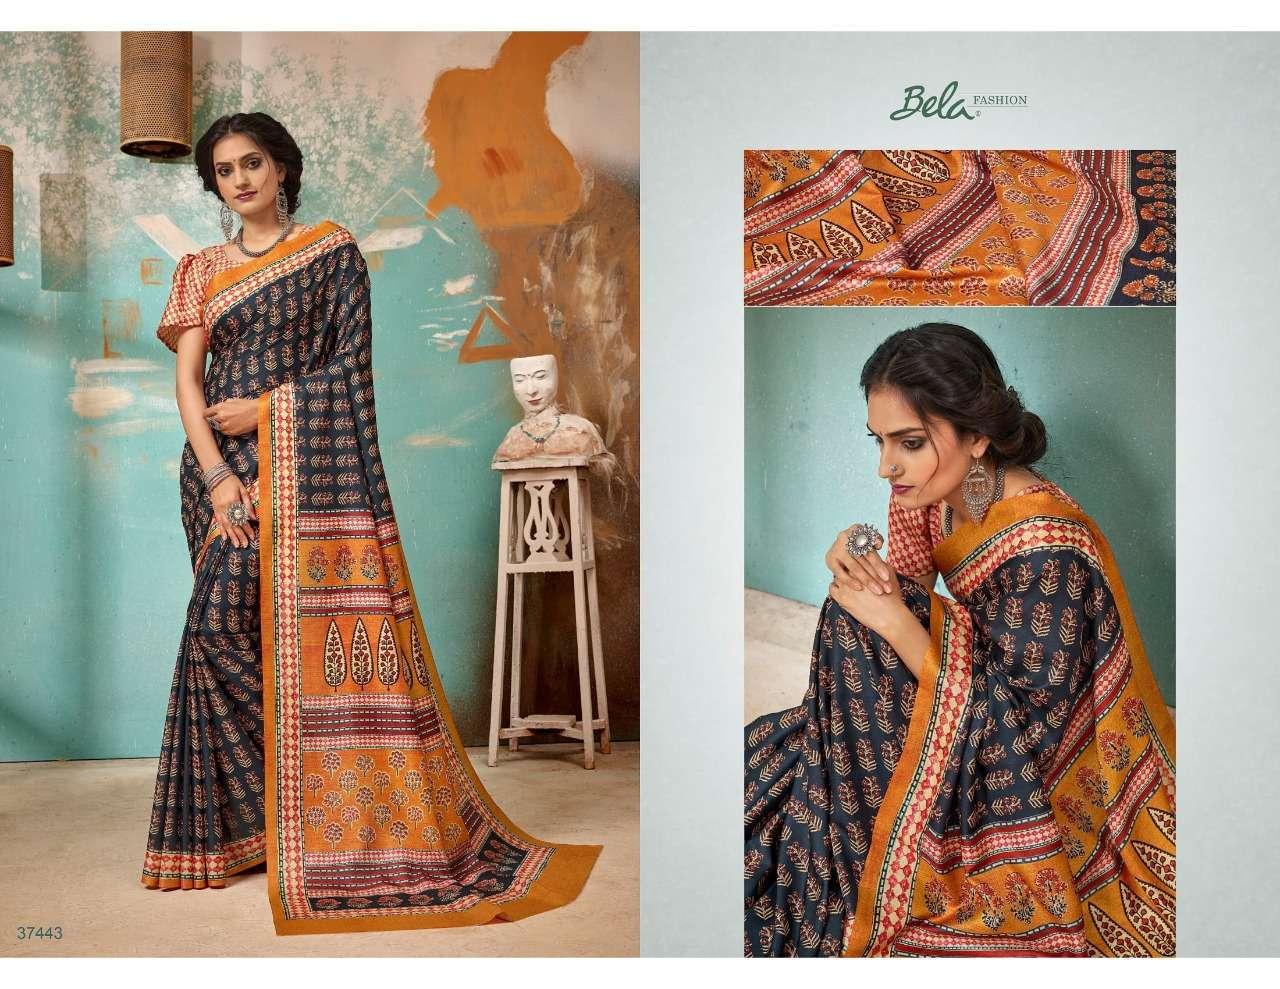 Bela Fashion Tulsi Khadi Silk With Digital Print Sarees Collection 02